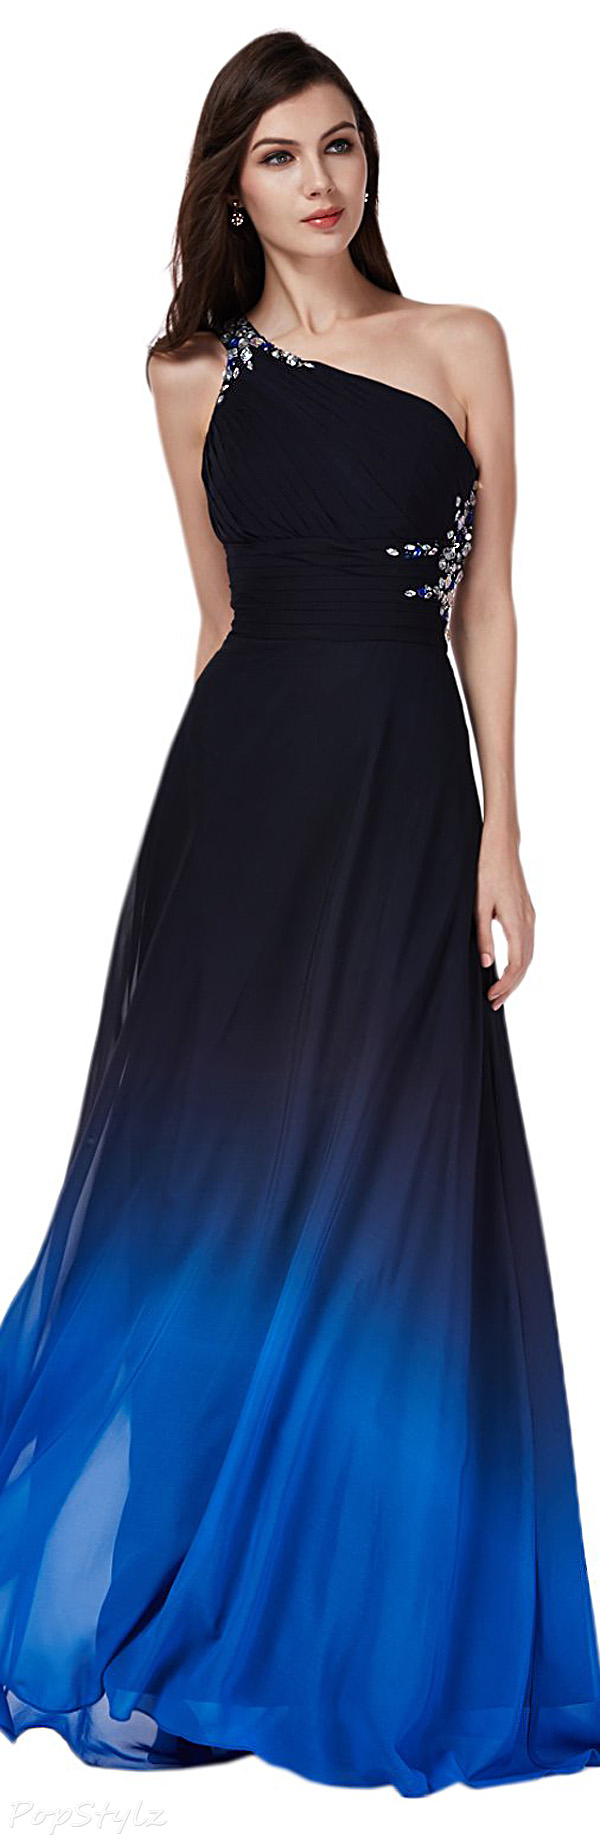 Sunvary 2016 Gradient Custom Colors Long Formal Dress